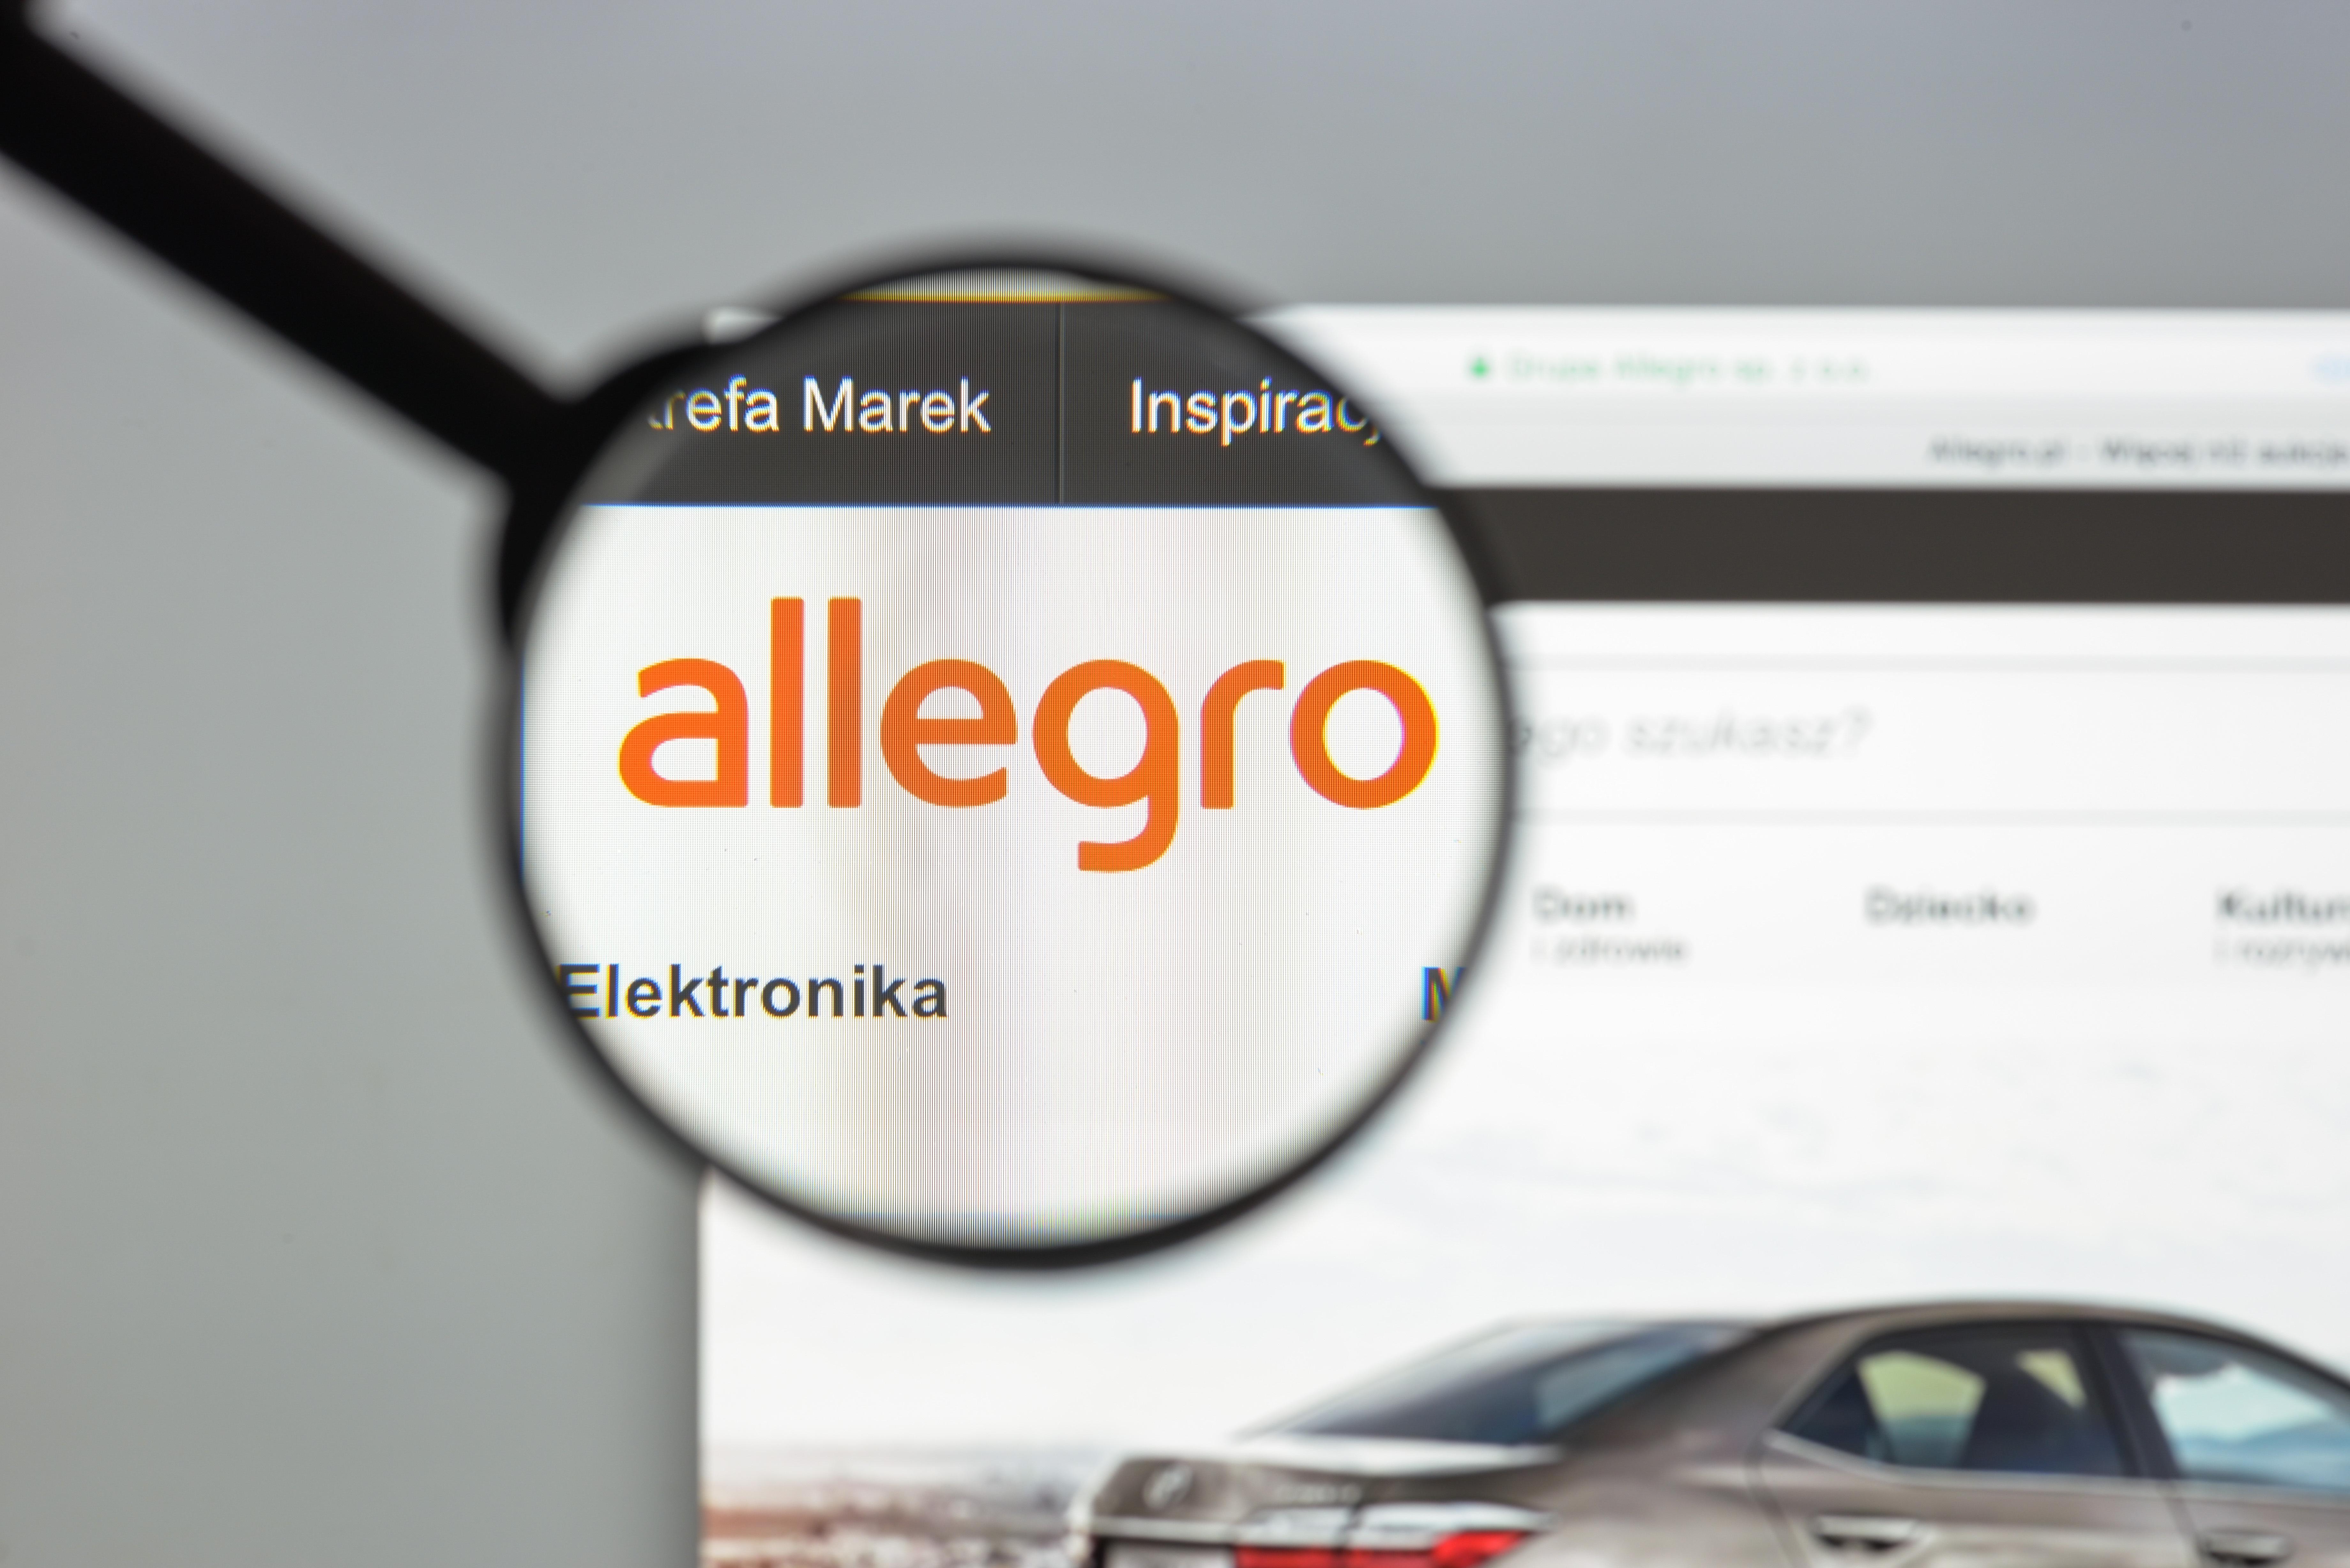 Allegro zamiast OLX? CyberRescue ostrzega!